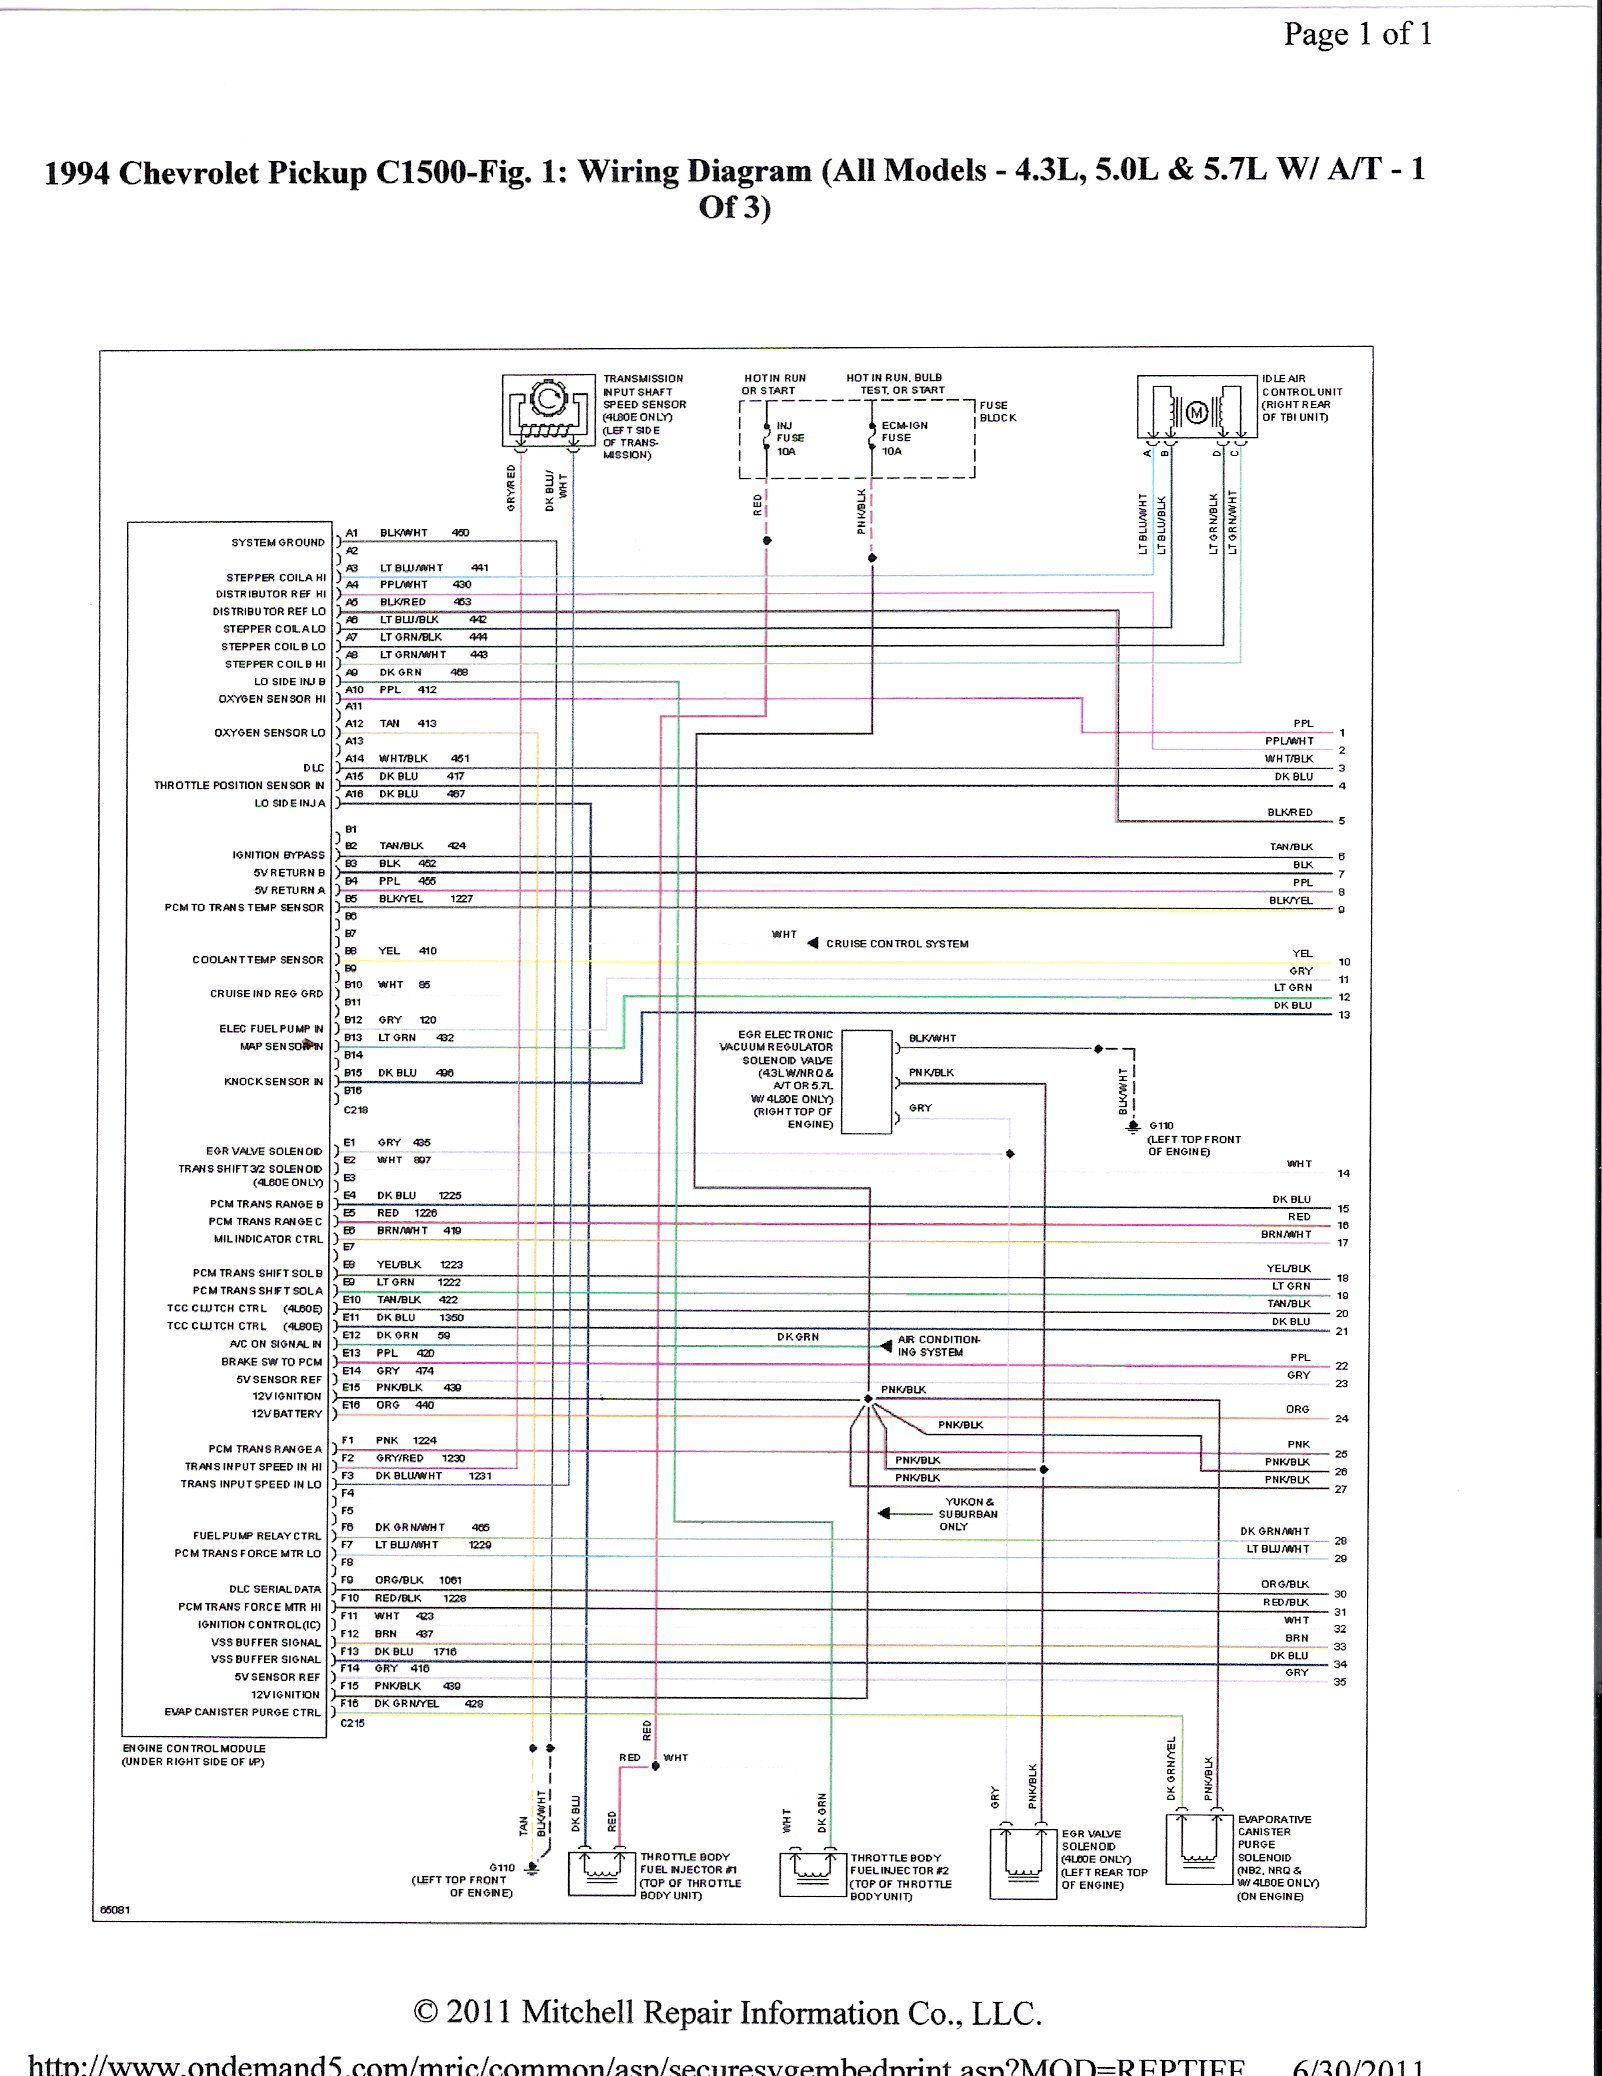 hight resolution of 1994 c1500 wiring diagram wiring diagram forward 1994 chevrolet c1500 wiring diagram 1994 c1500 wiring diagram